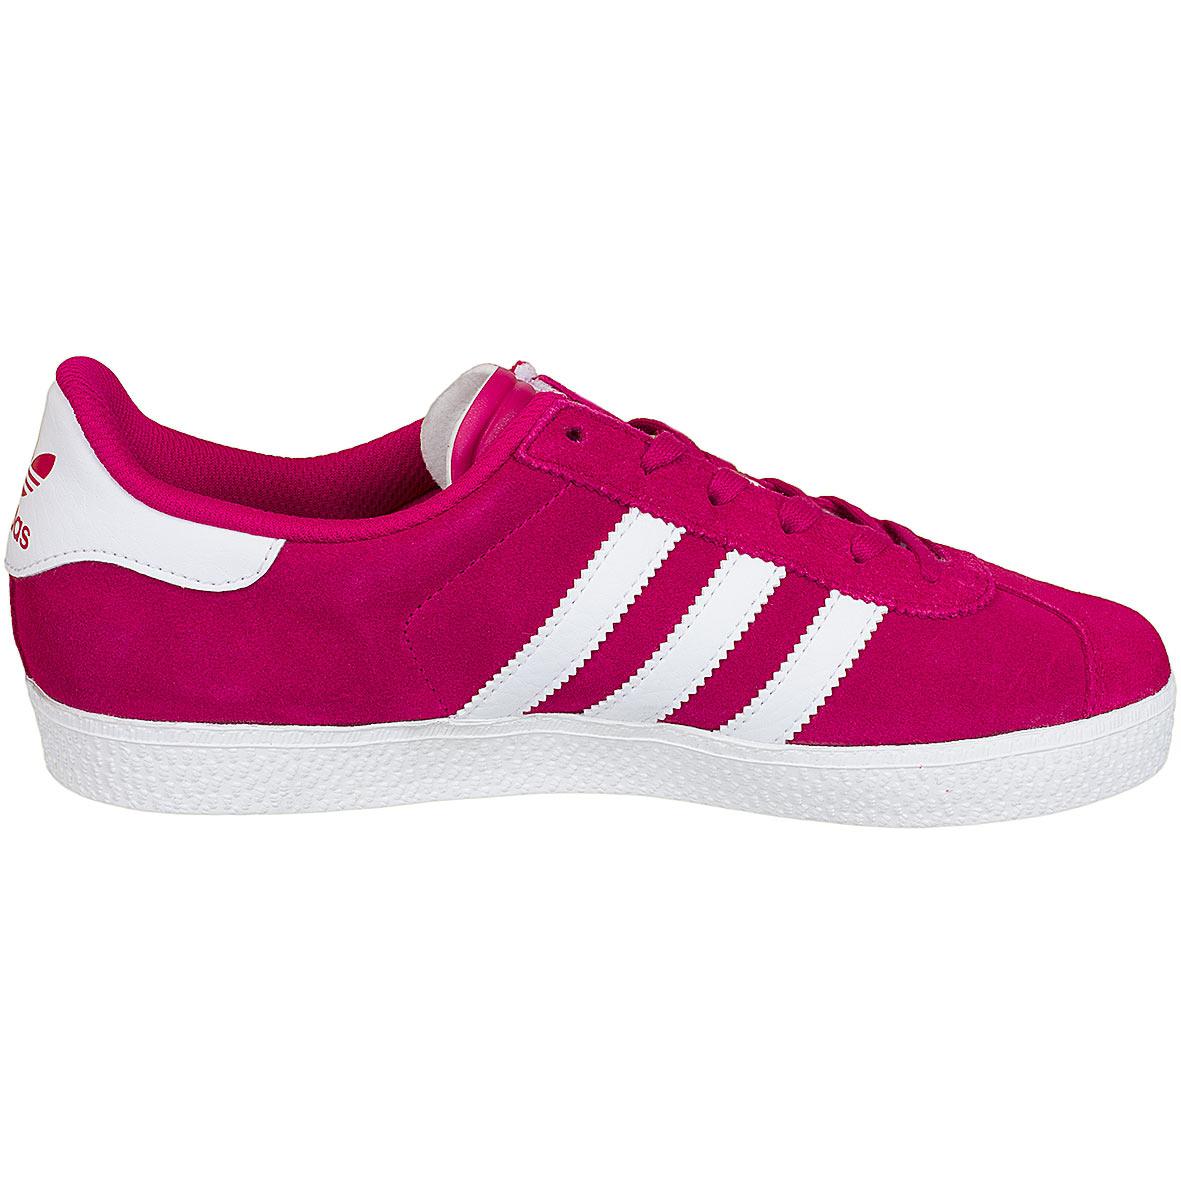 adidas originals damen sneaker gazelle 2 j w pink wei. Black Bedroom Furniture Sets. Home Design Ideas